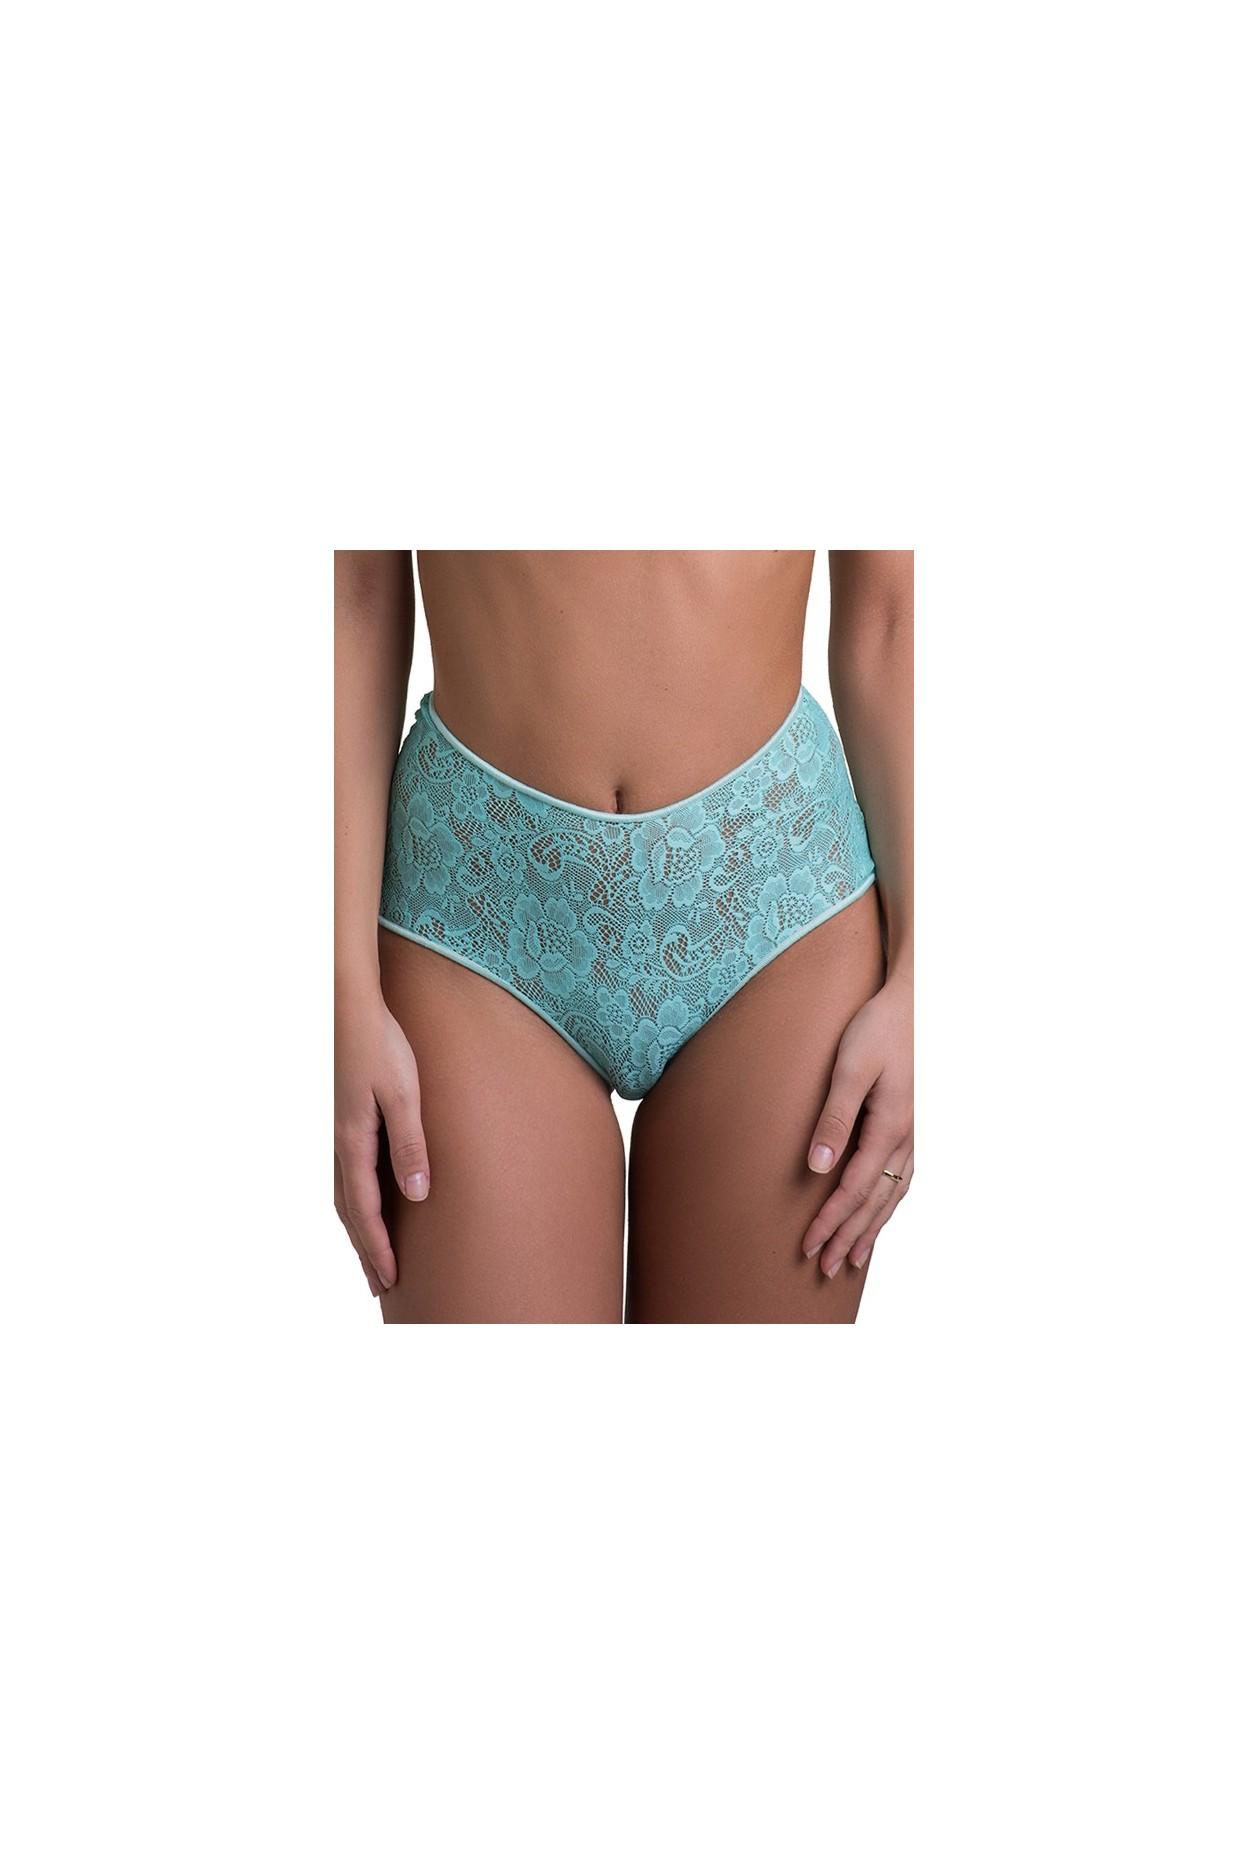 solange tiffany - slip intimo - donna - lingerie